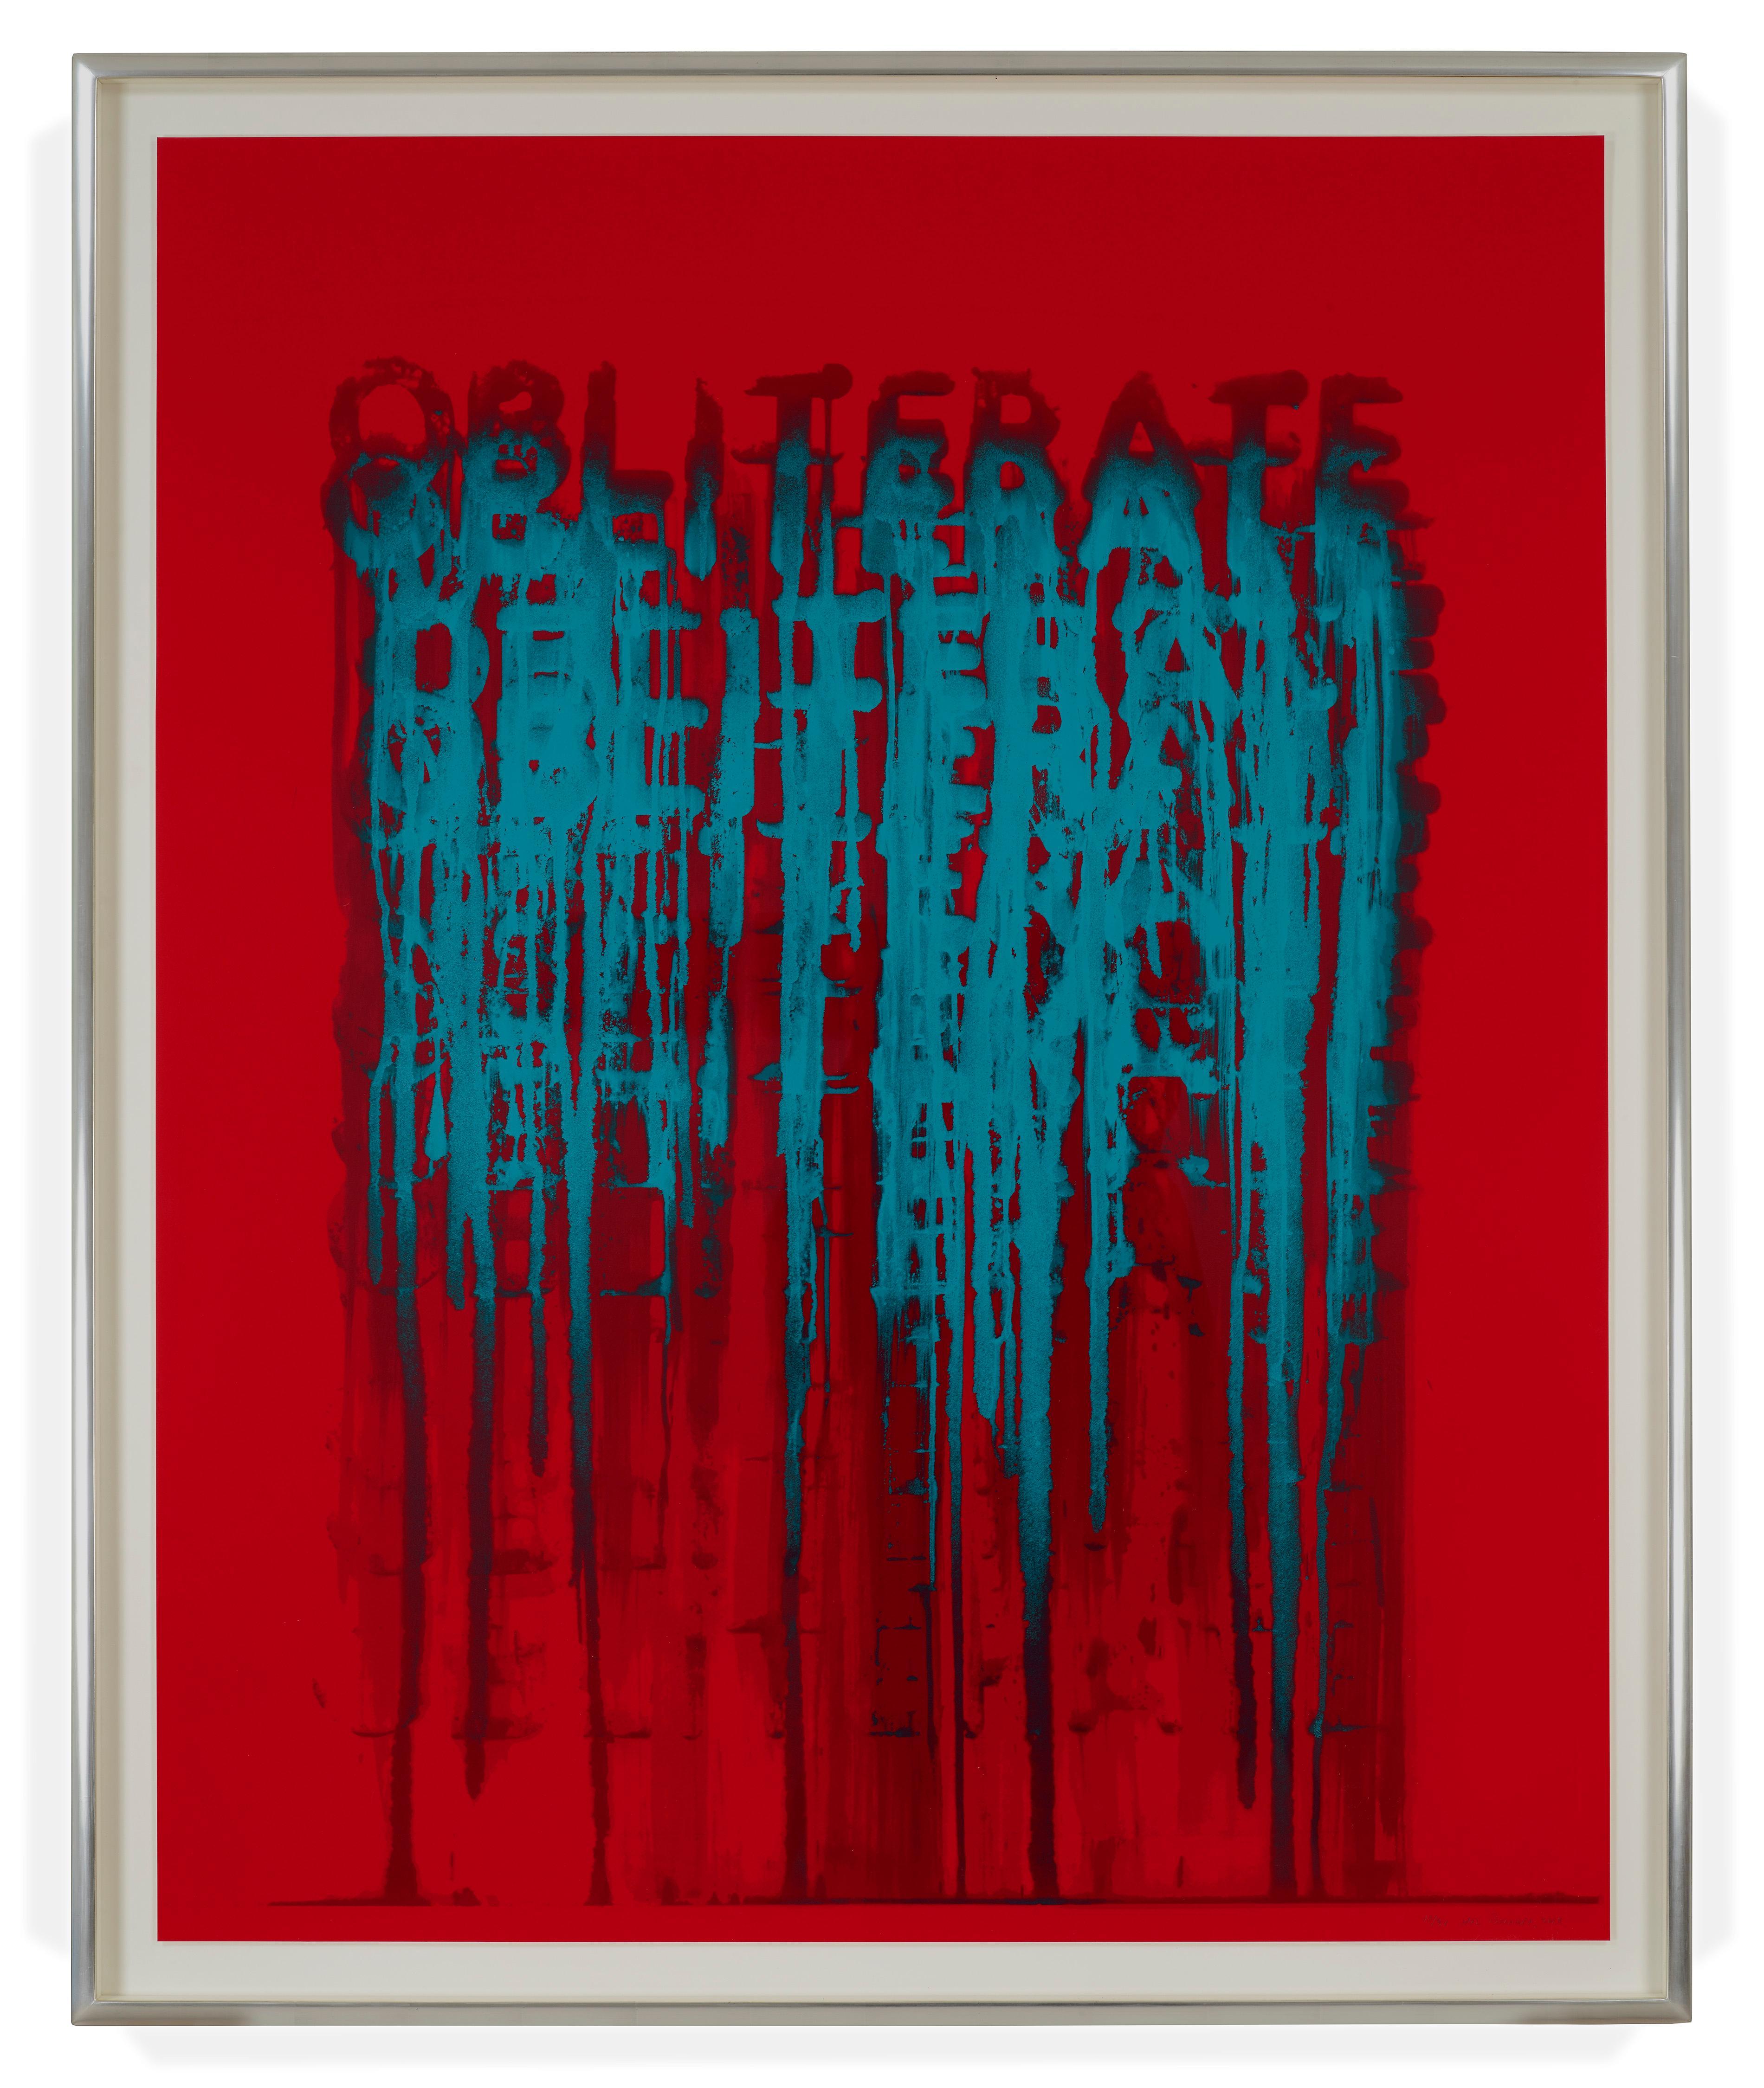 Obliterate, Limited Edition Silkscreen Print by American printmaker Mel Bochner